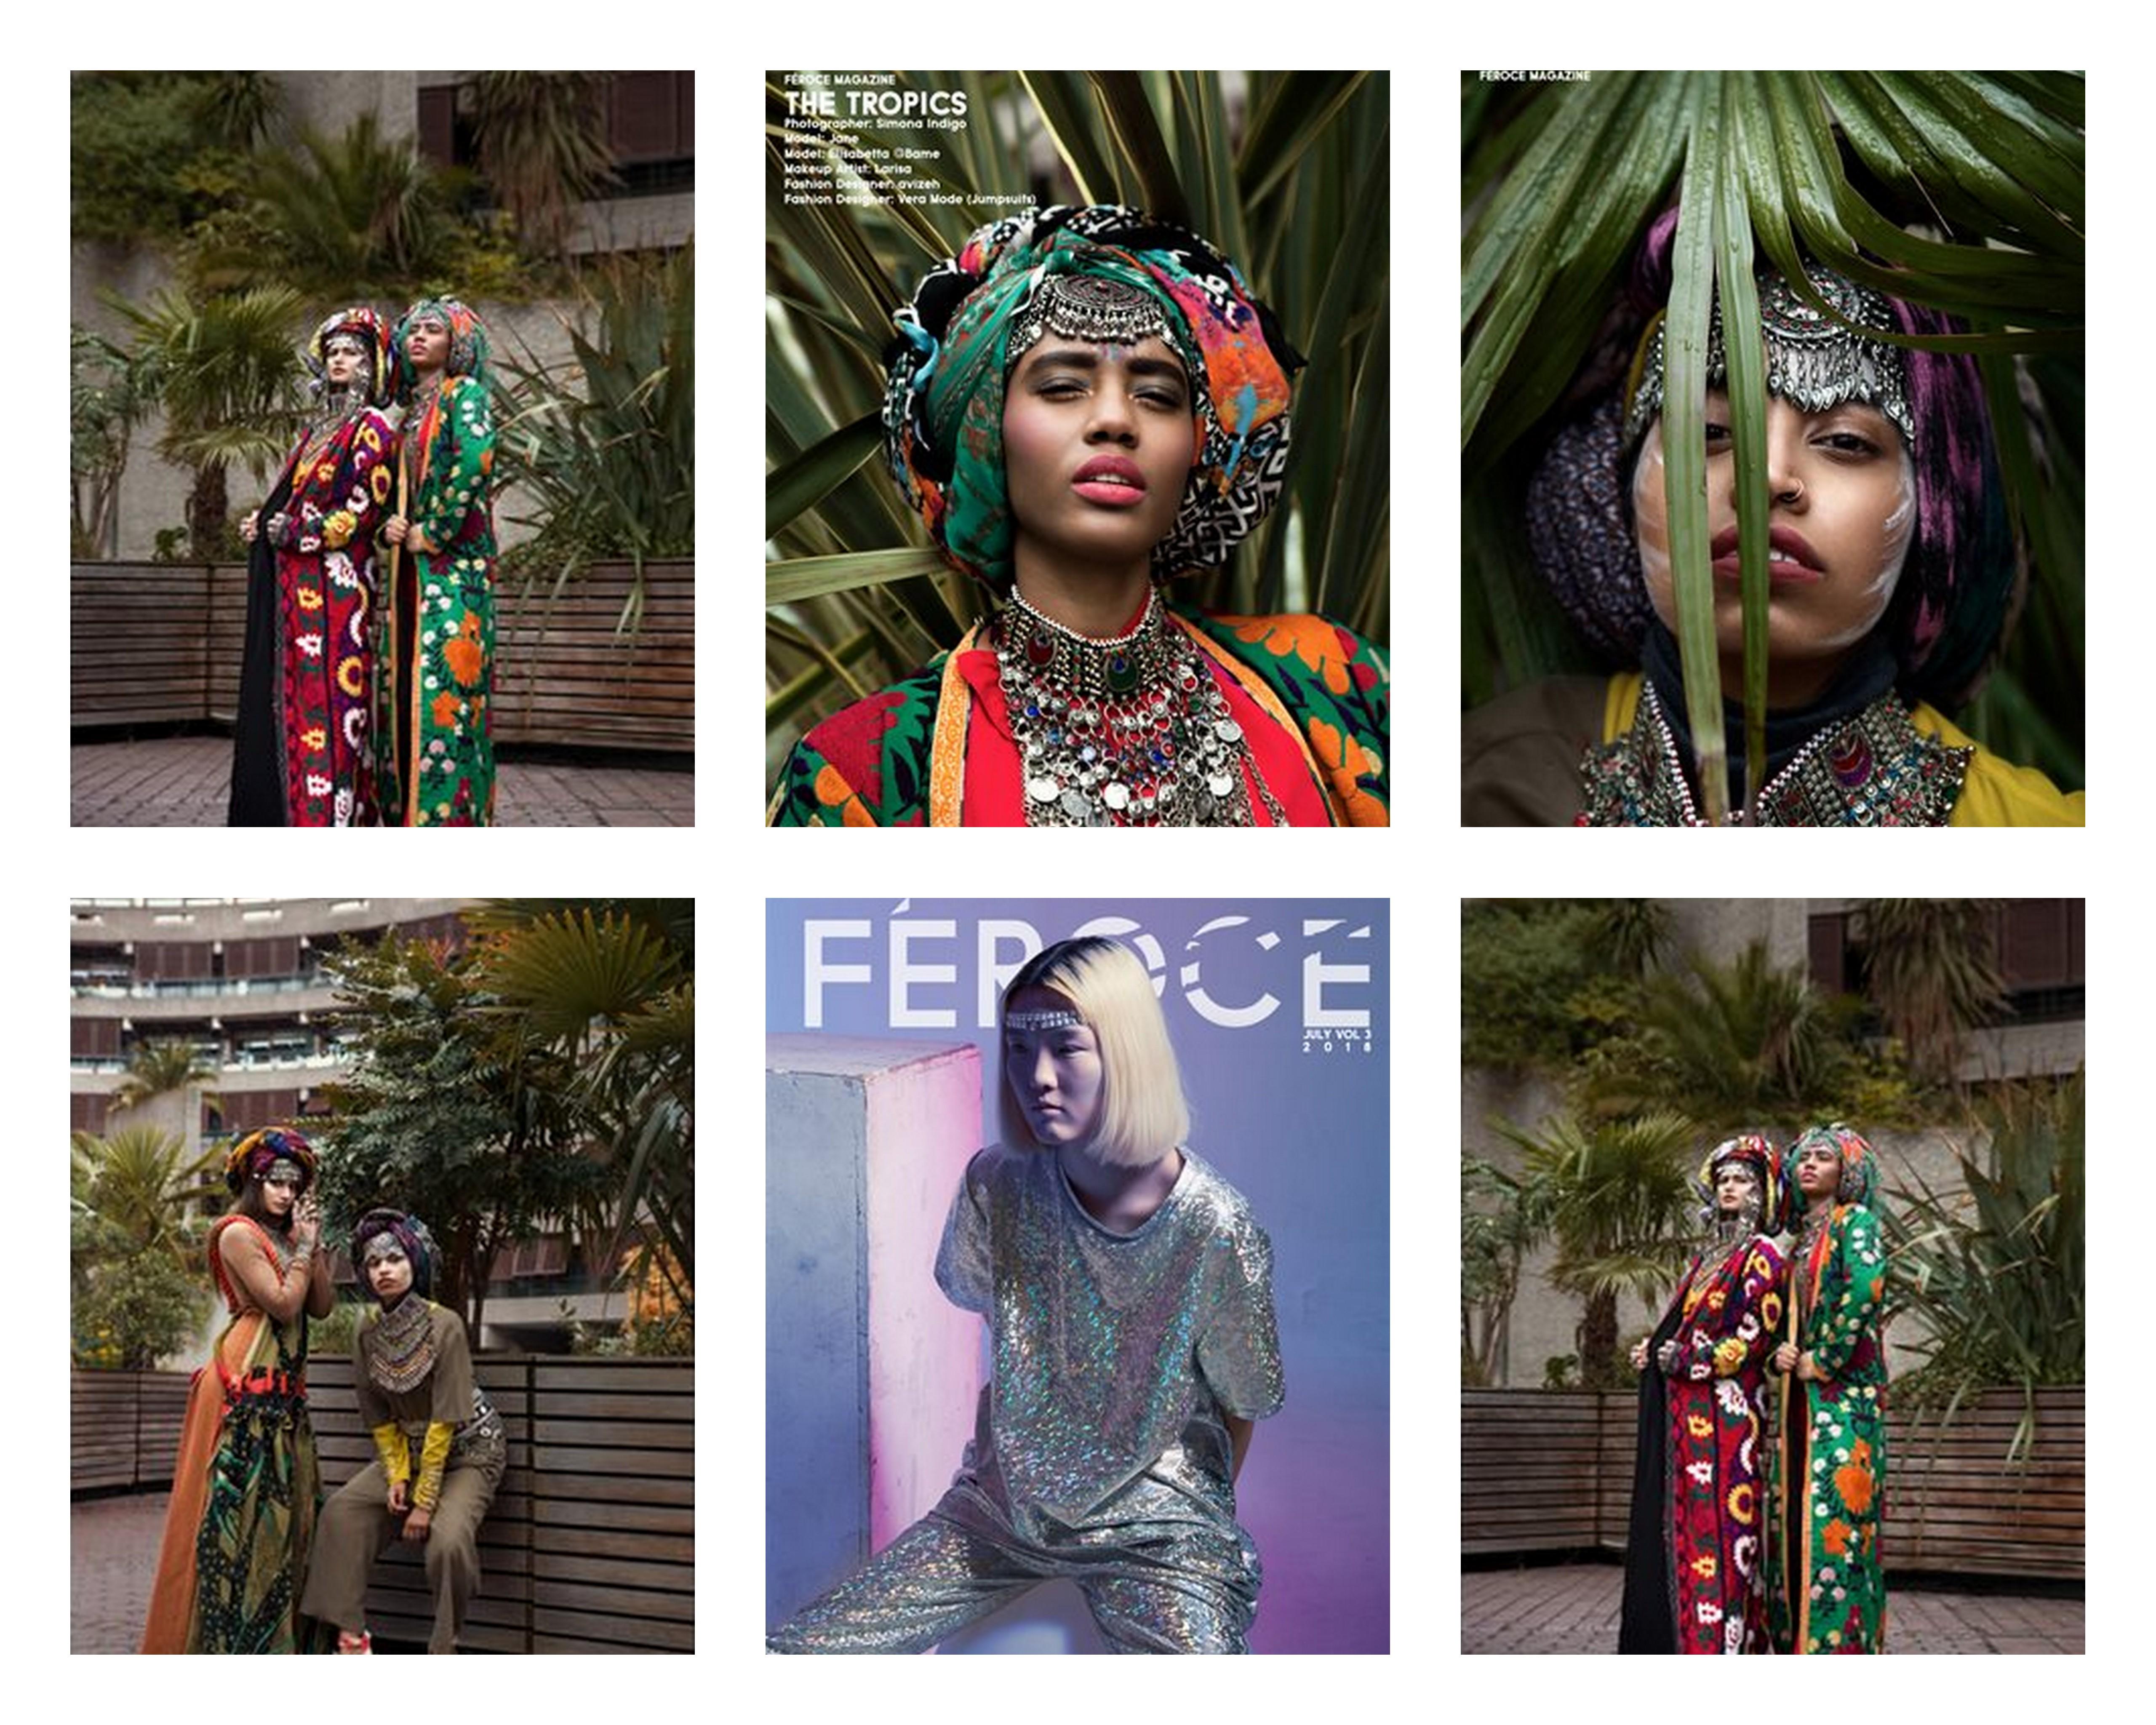 Feroce Magazine